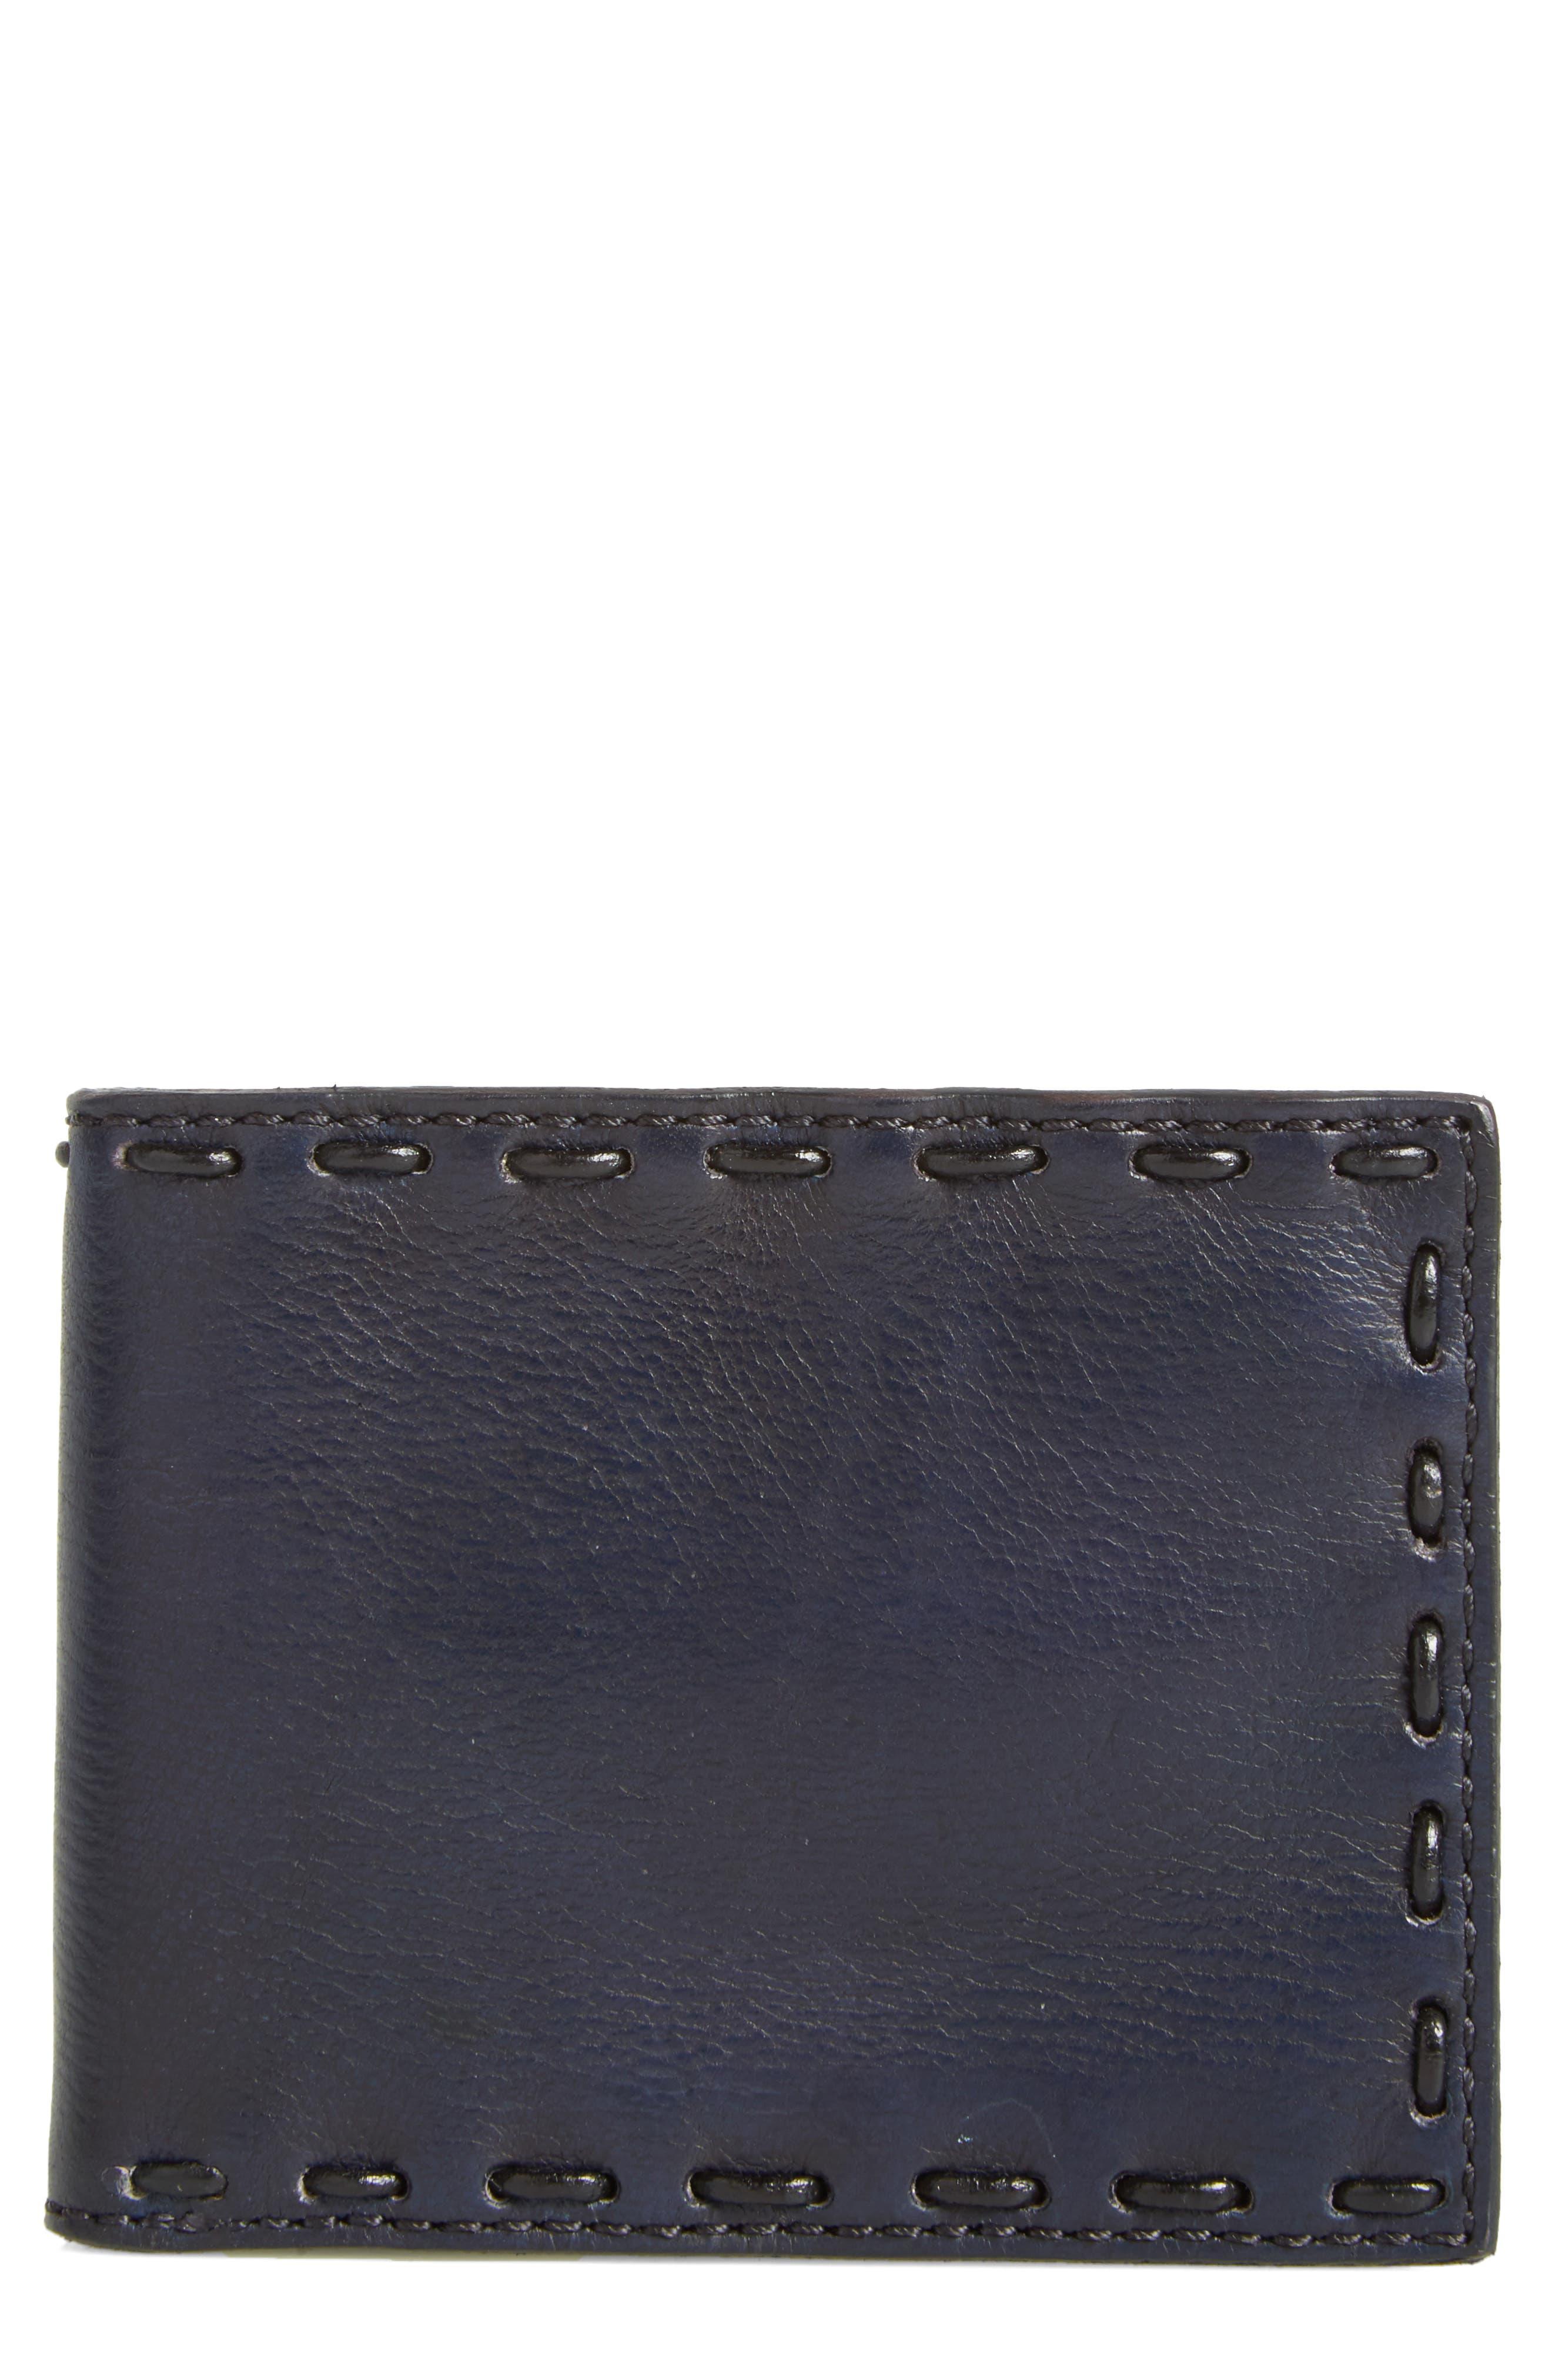 Pickstitch Leather Bifold Wallet,                             Main thumbnail 1, color,                             094